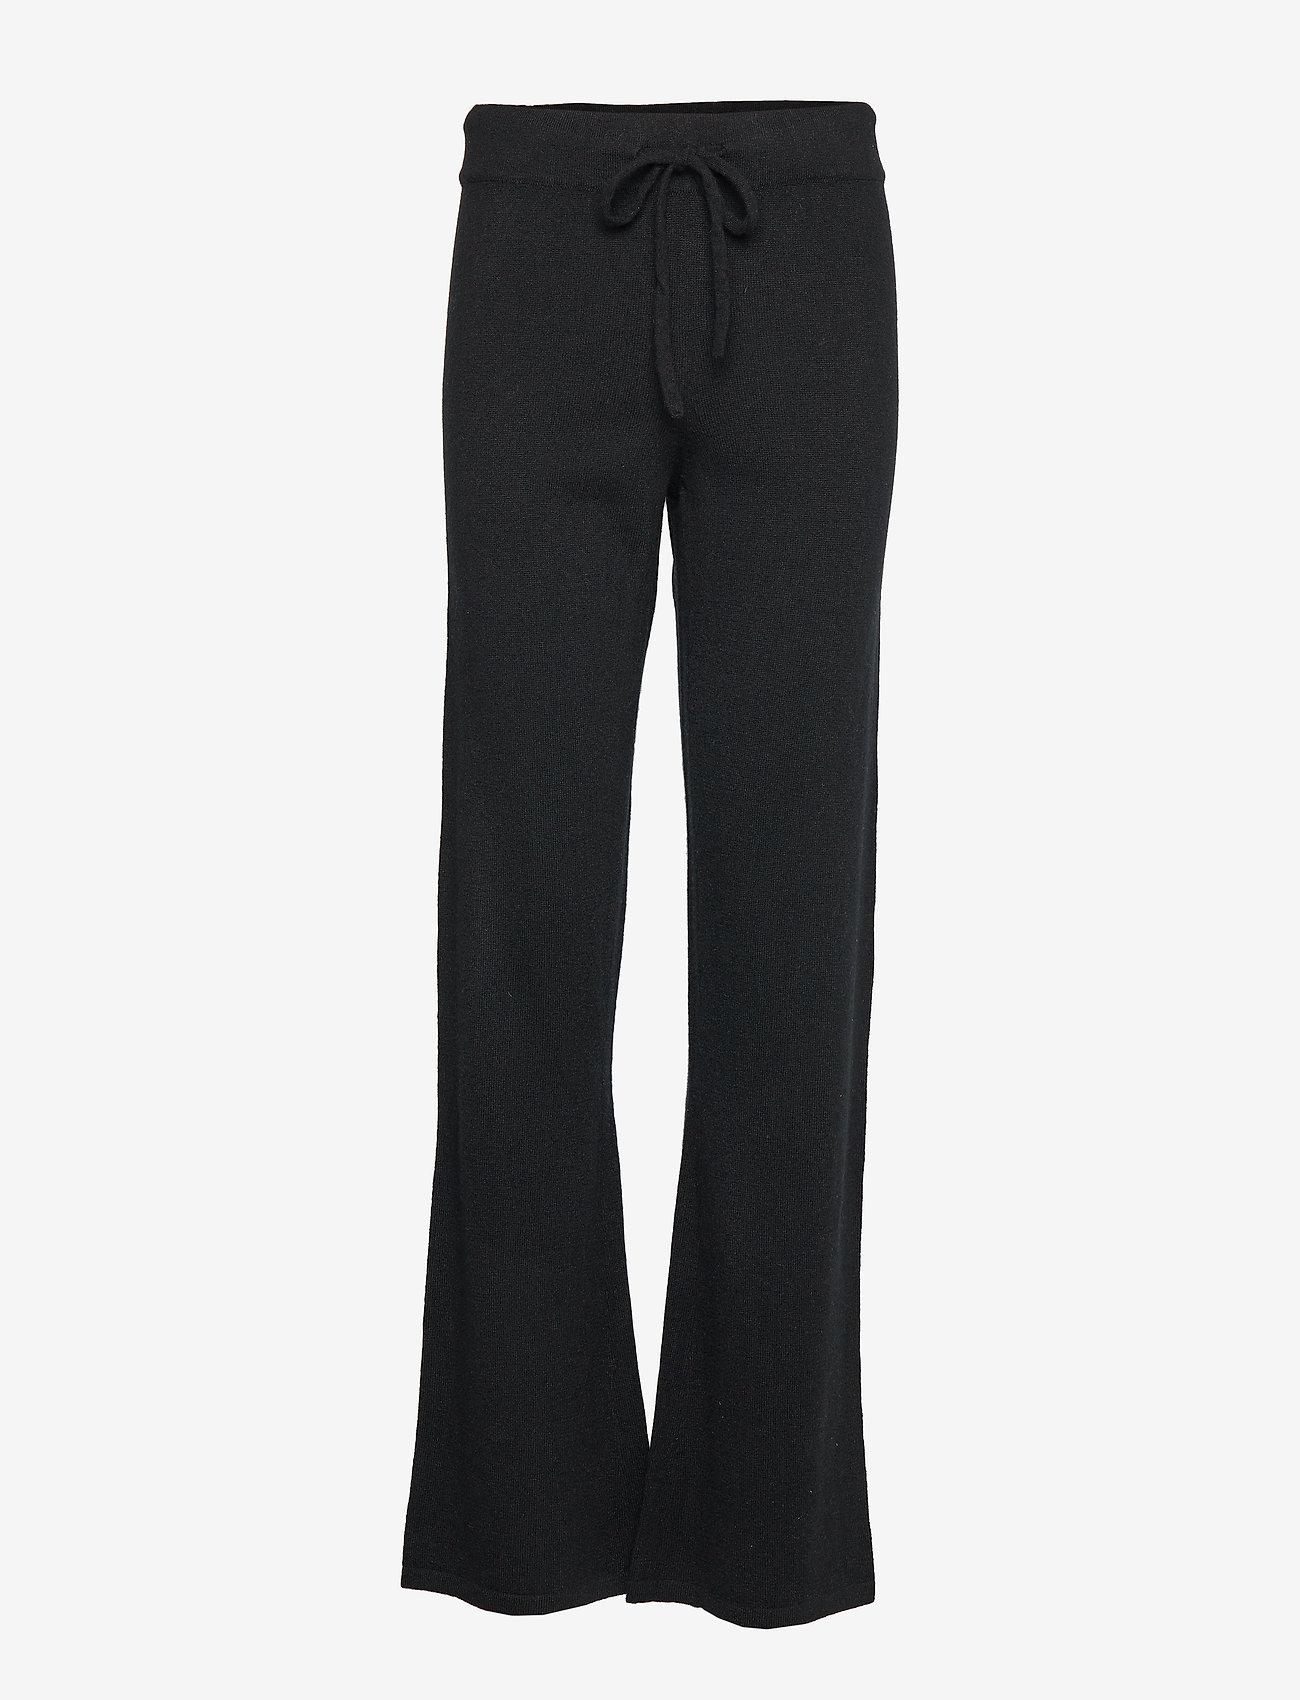 Davida Cashmere - Pants - wide leg trousers - black - 1